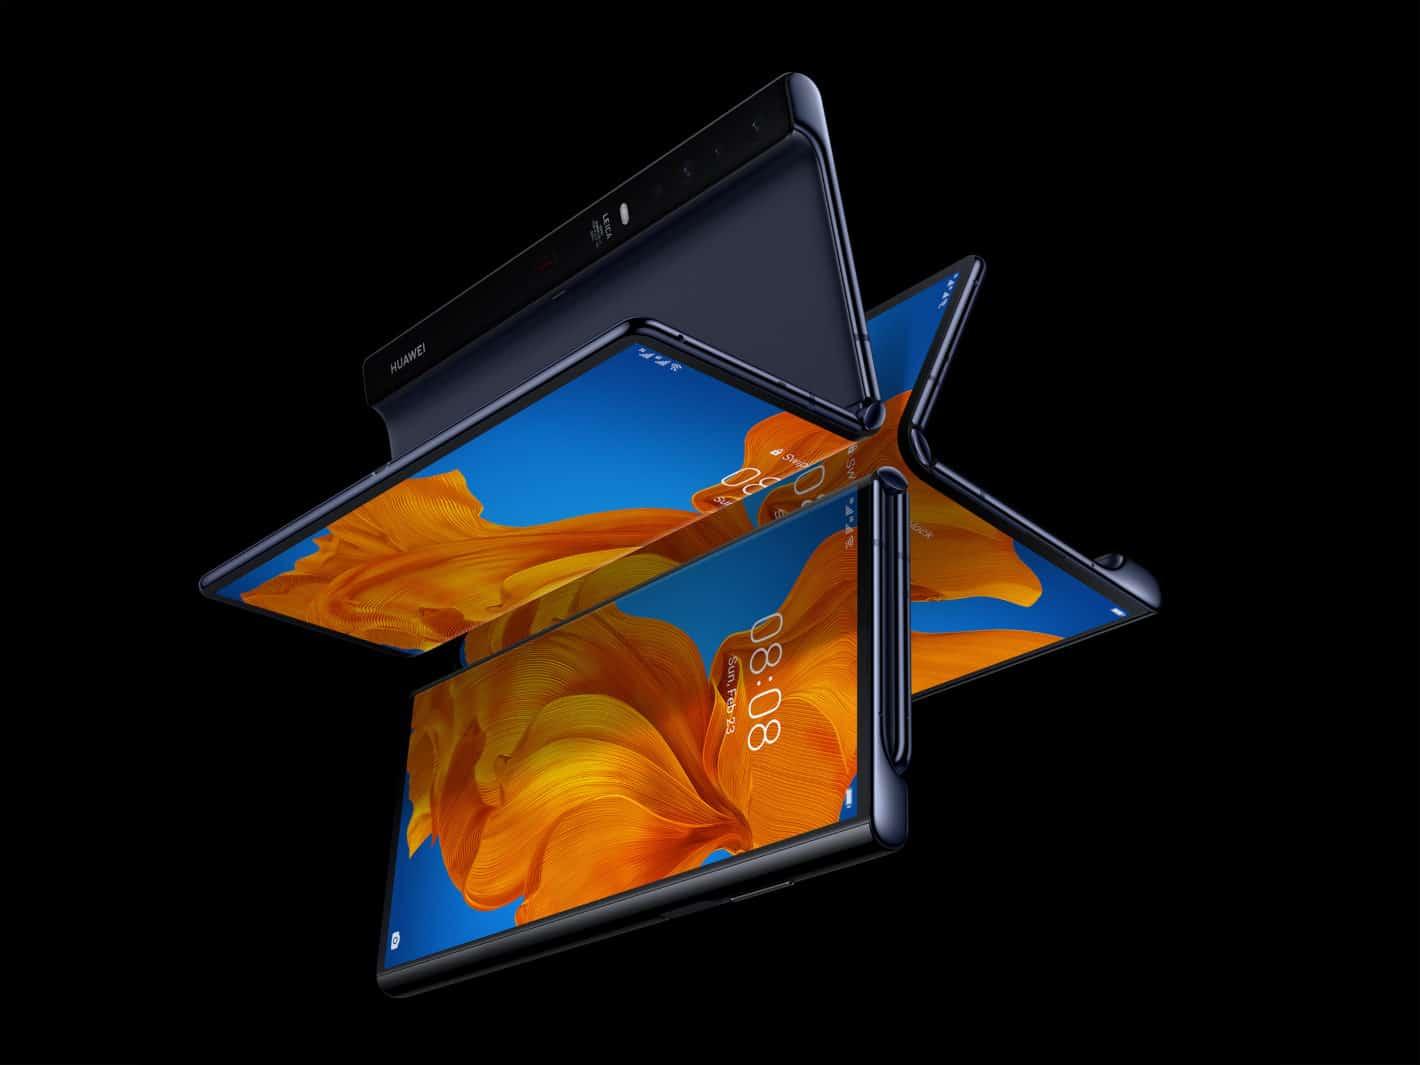 Huawei chystá skládací telefon Mate V